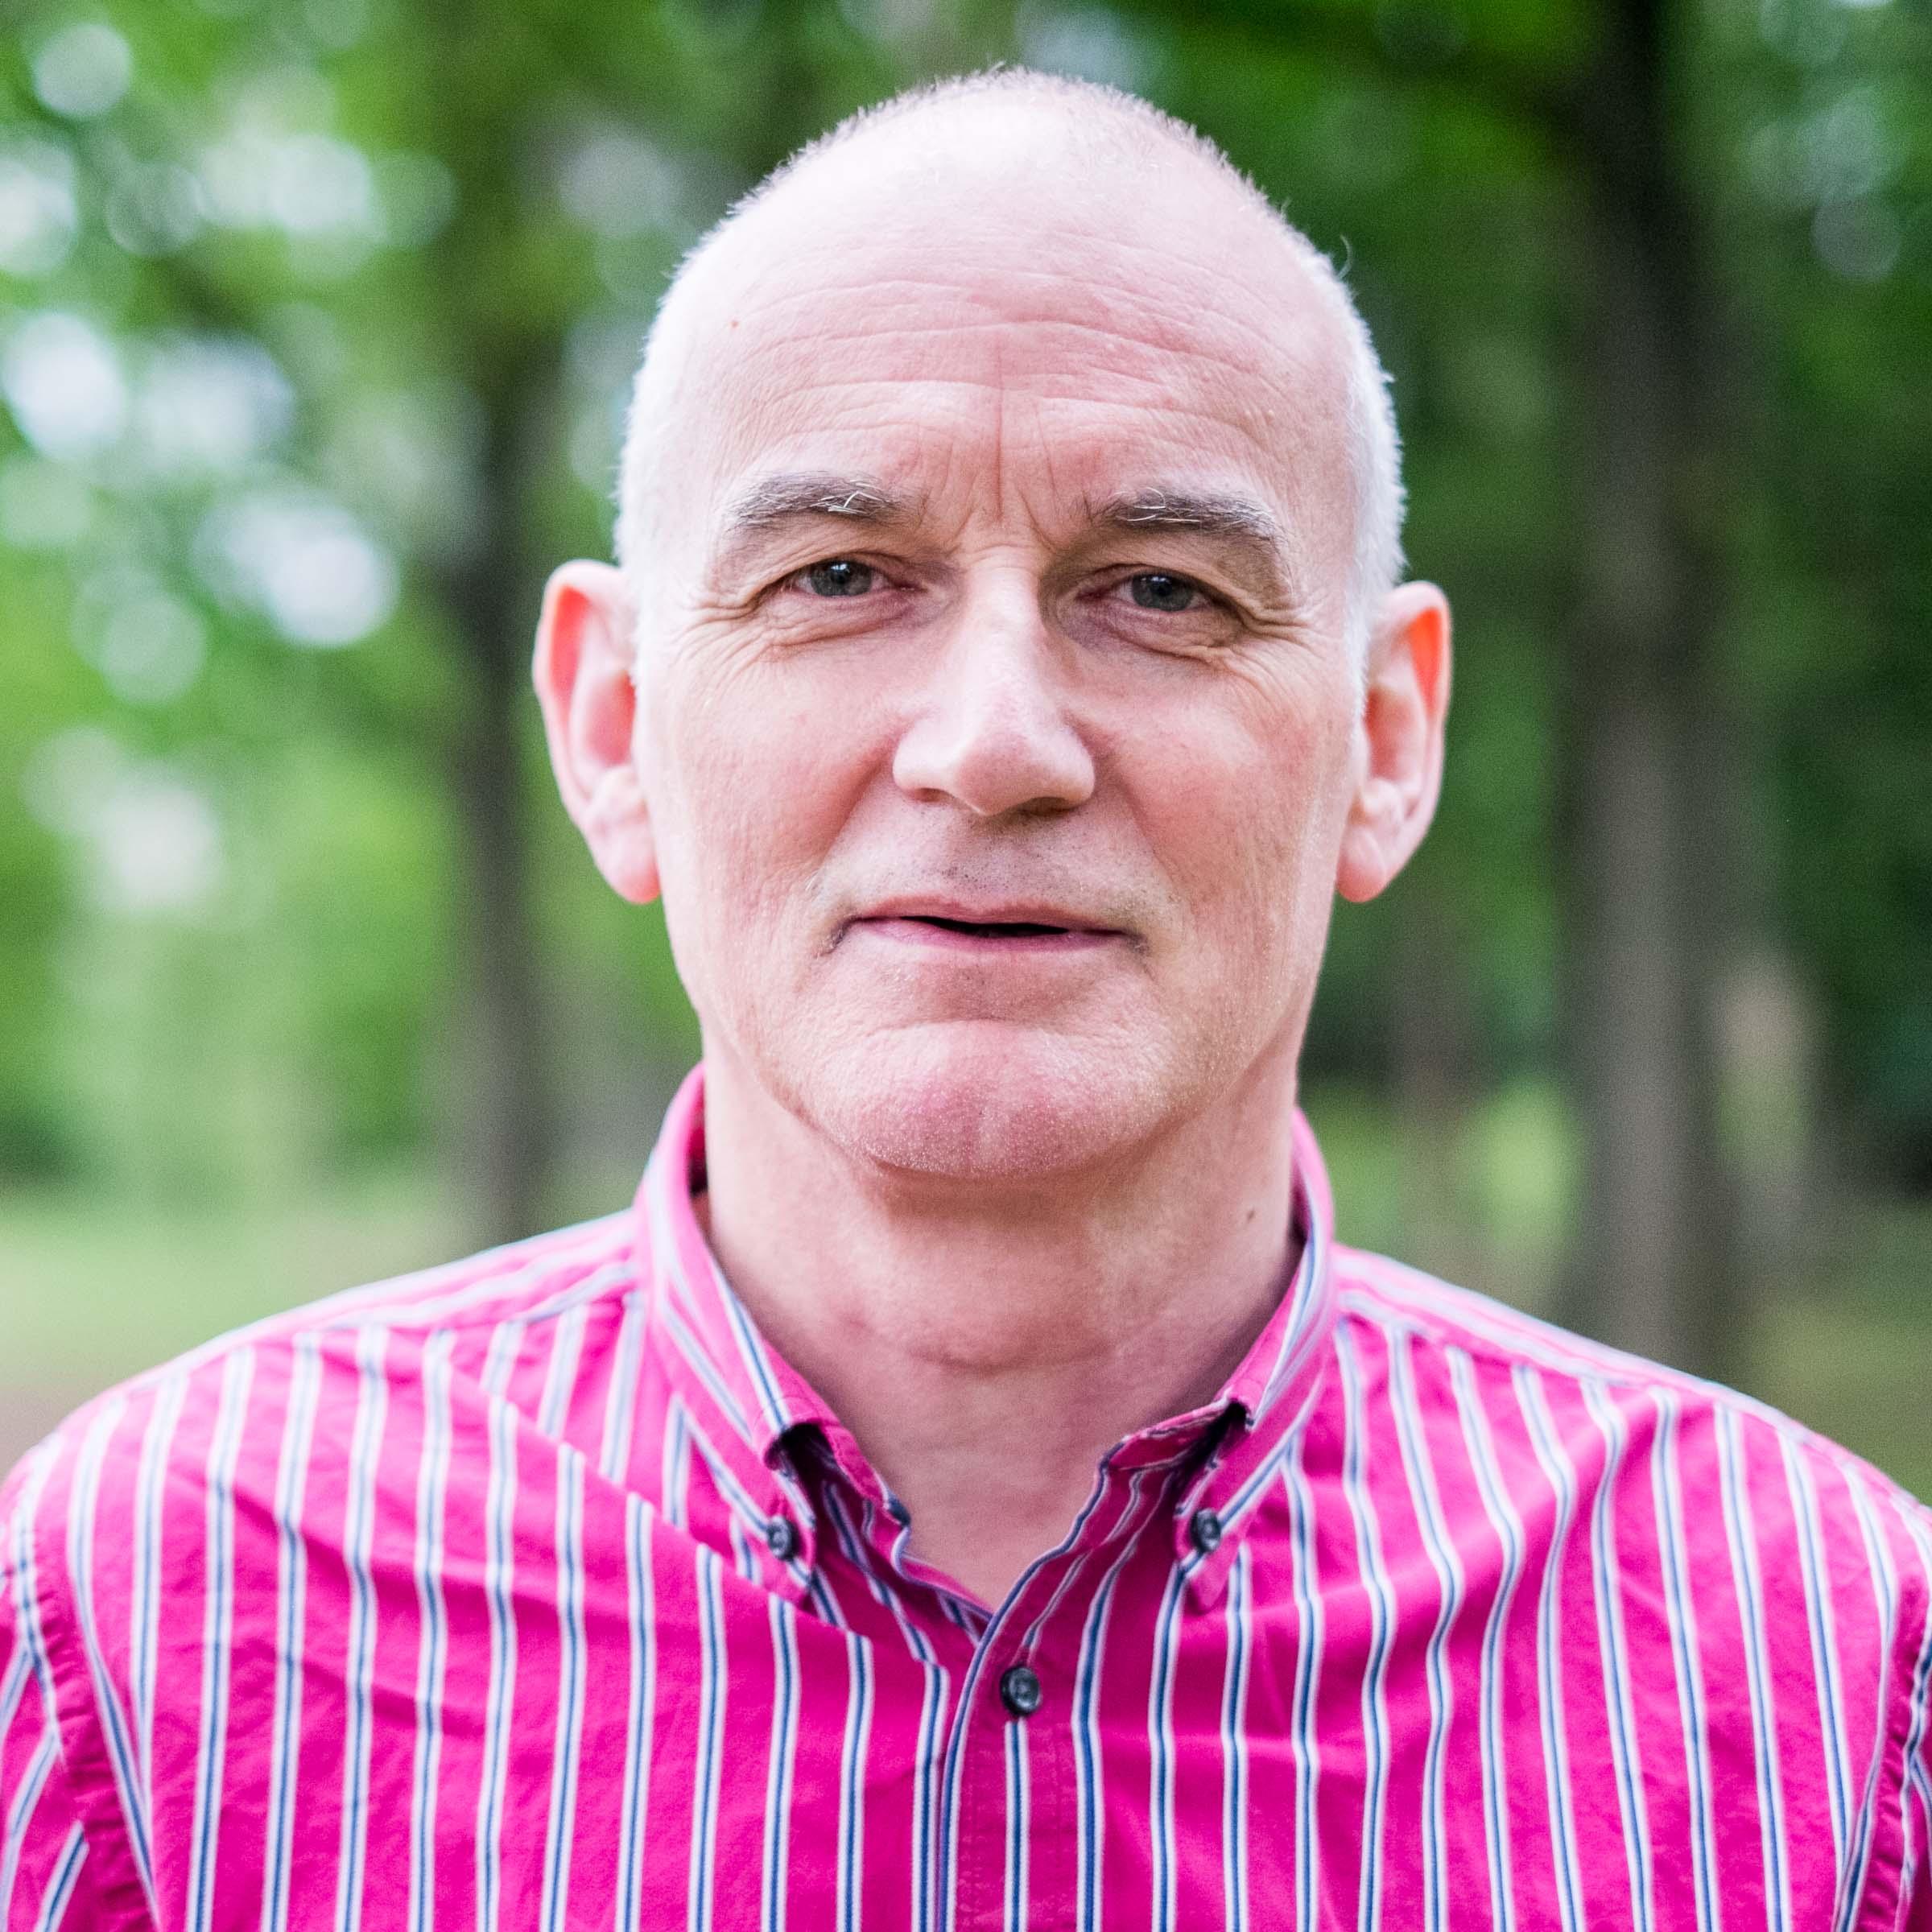 ALUN REYNOLDS - UKCP REGISTERED PSYCHOTHERAPIST & FAMILY CONSTELLATION PRACTITIONER